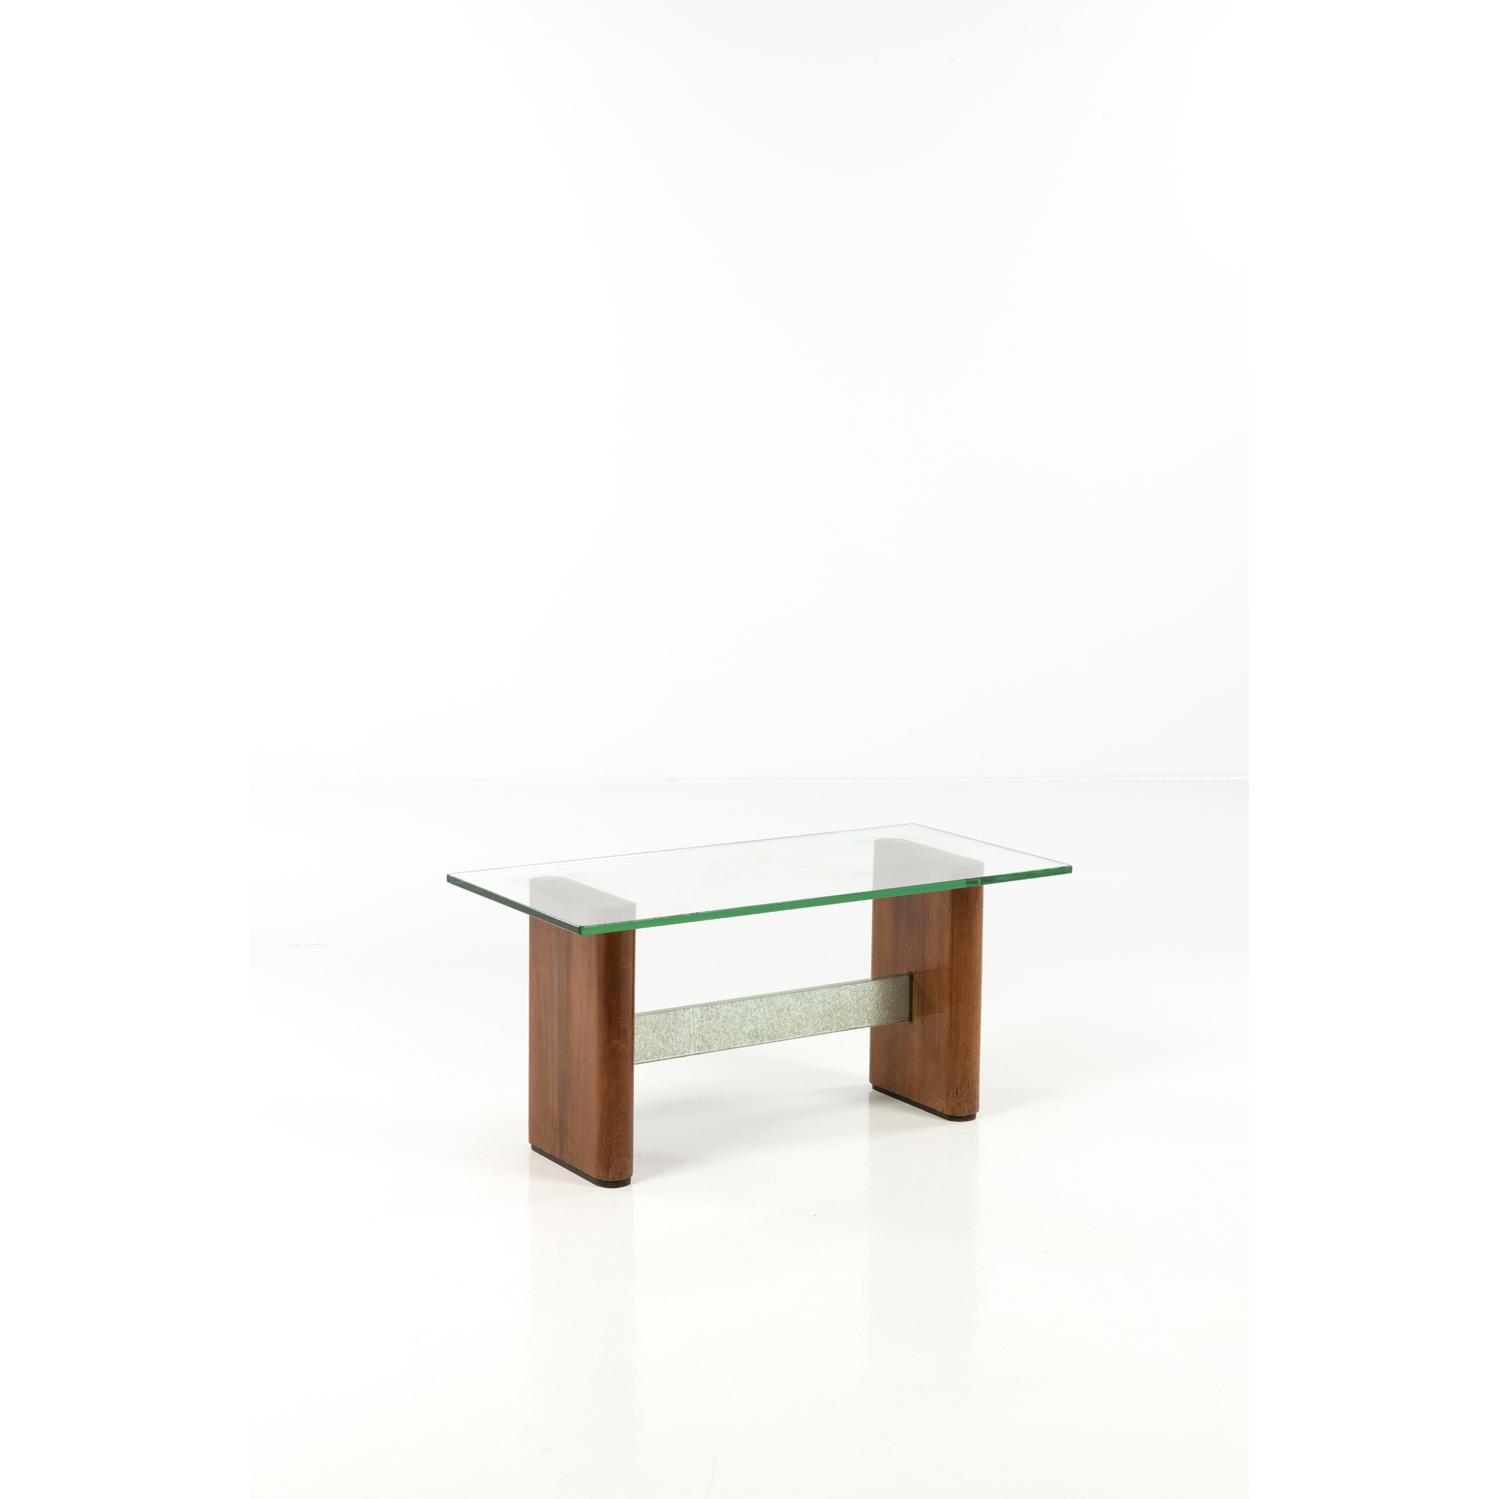 À Basse À Table ArteAttribué Fontana Table Fontana Basse ArteAttribué bf7gY6y